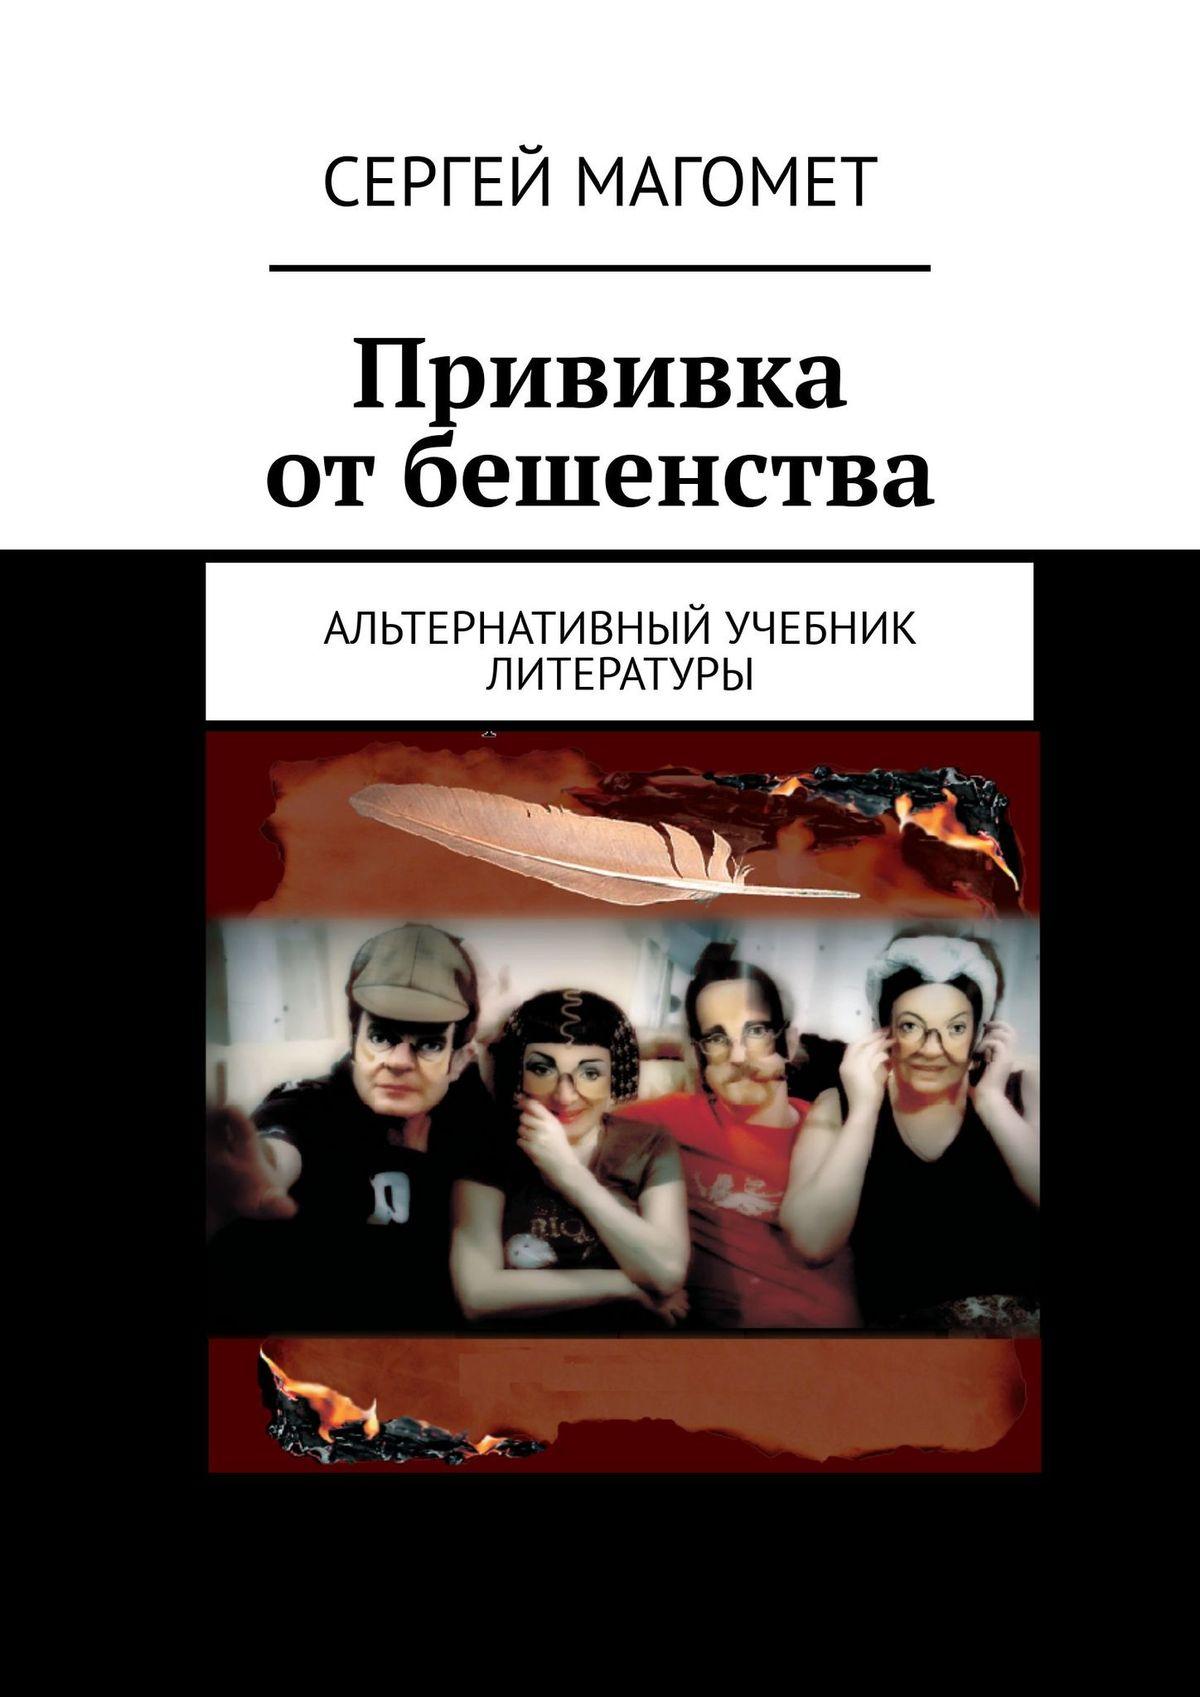 Сергей Магомет Прививка отбешенства сергей магомет прививка отбешенства isbn 9785447451455